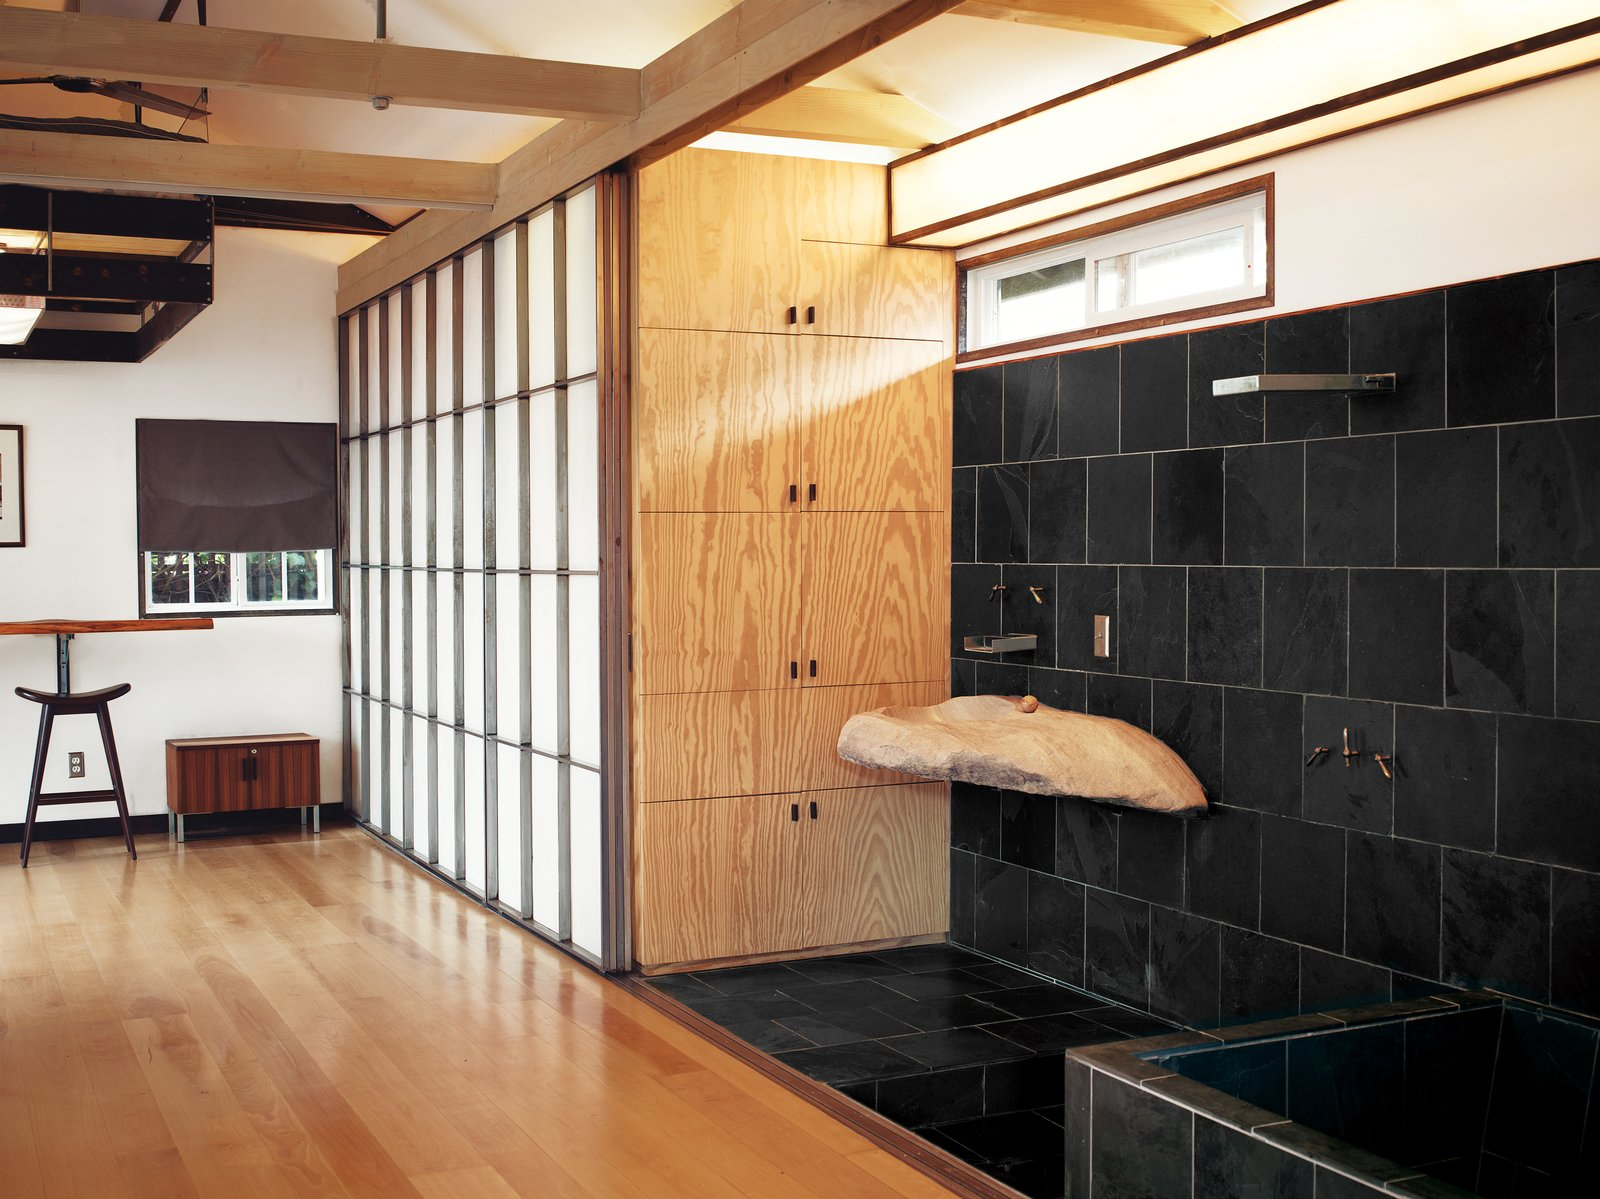 Vincent Kartheiser renovation funn roberts shower and tub